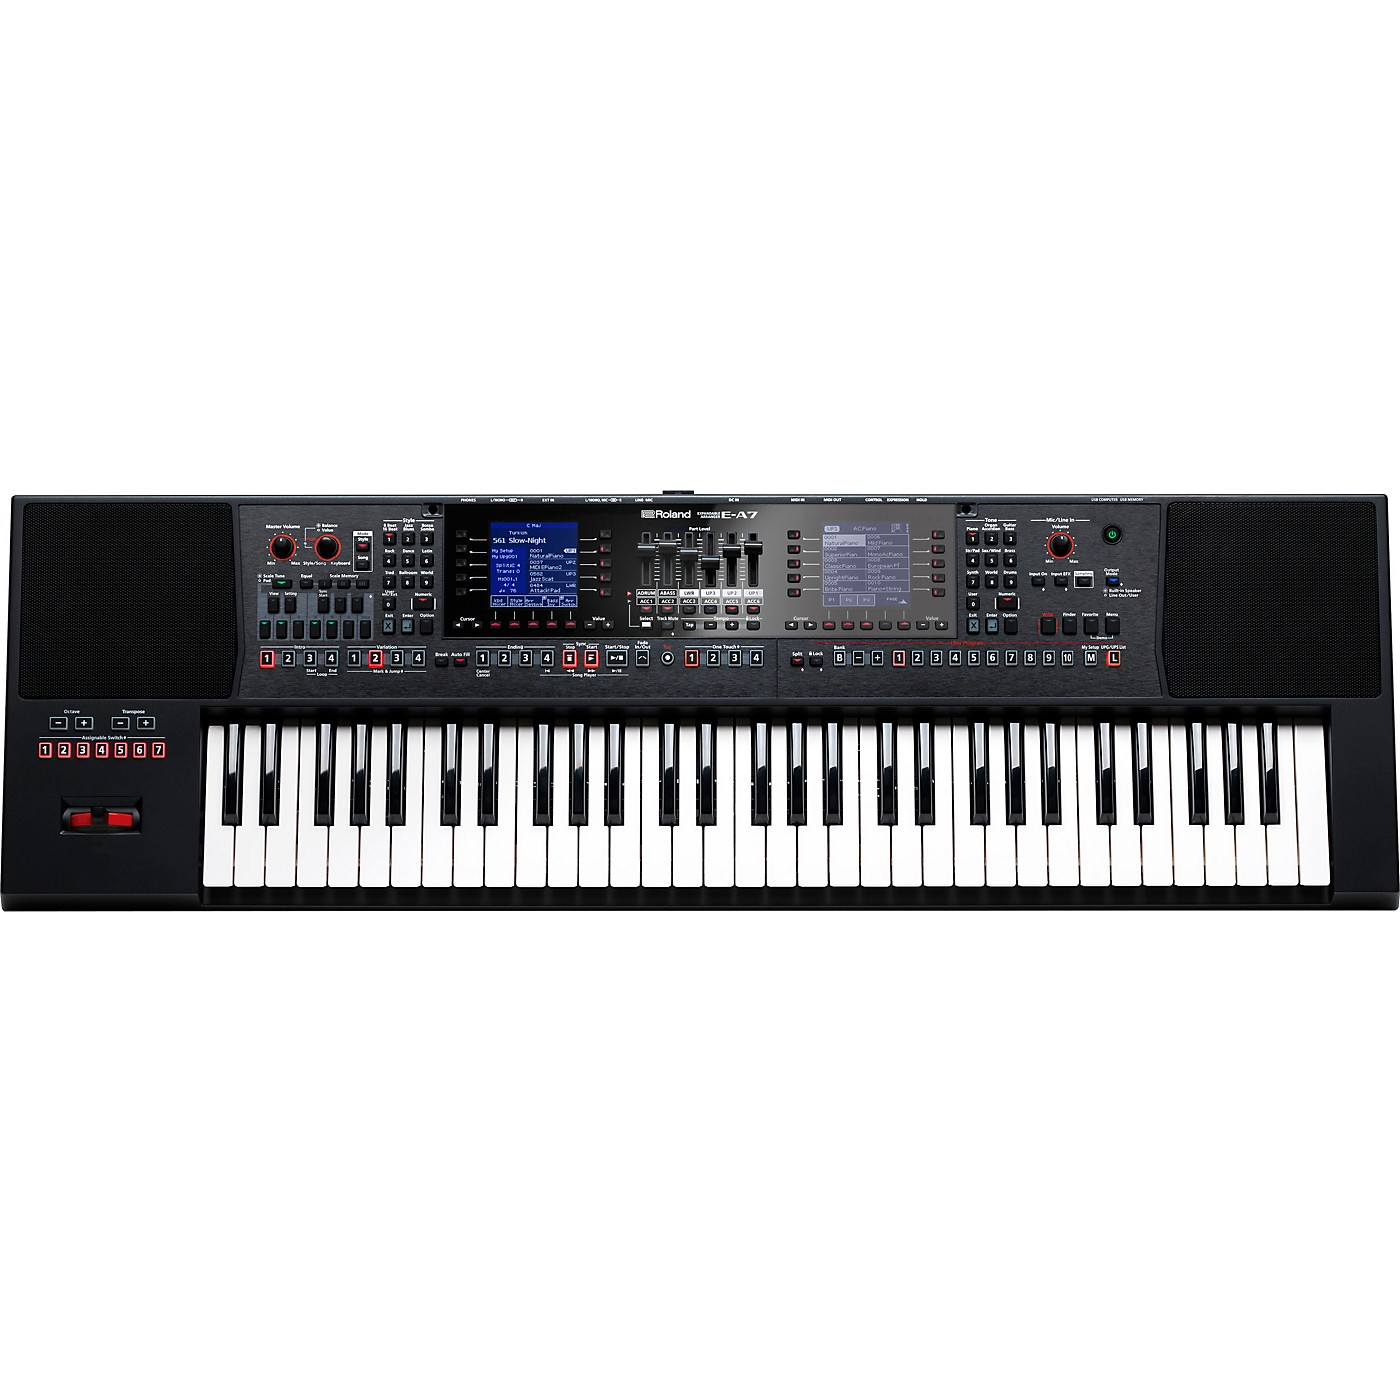 Roland E-A7 Arranger Keyboard thumbnail